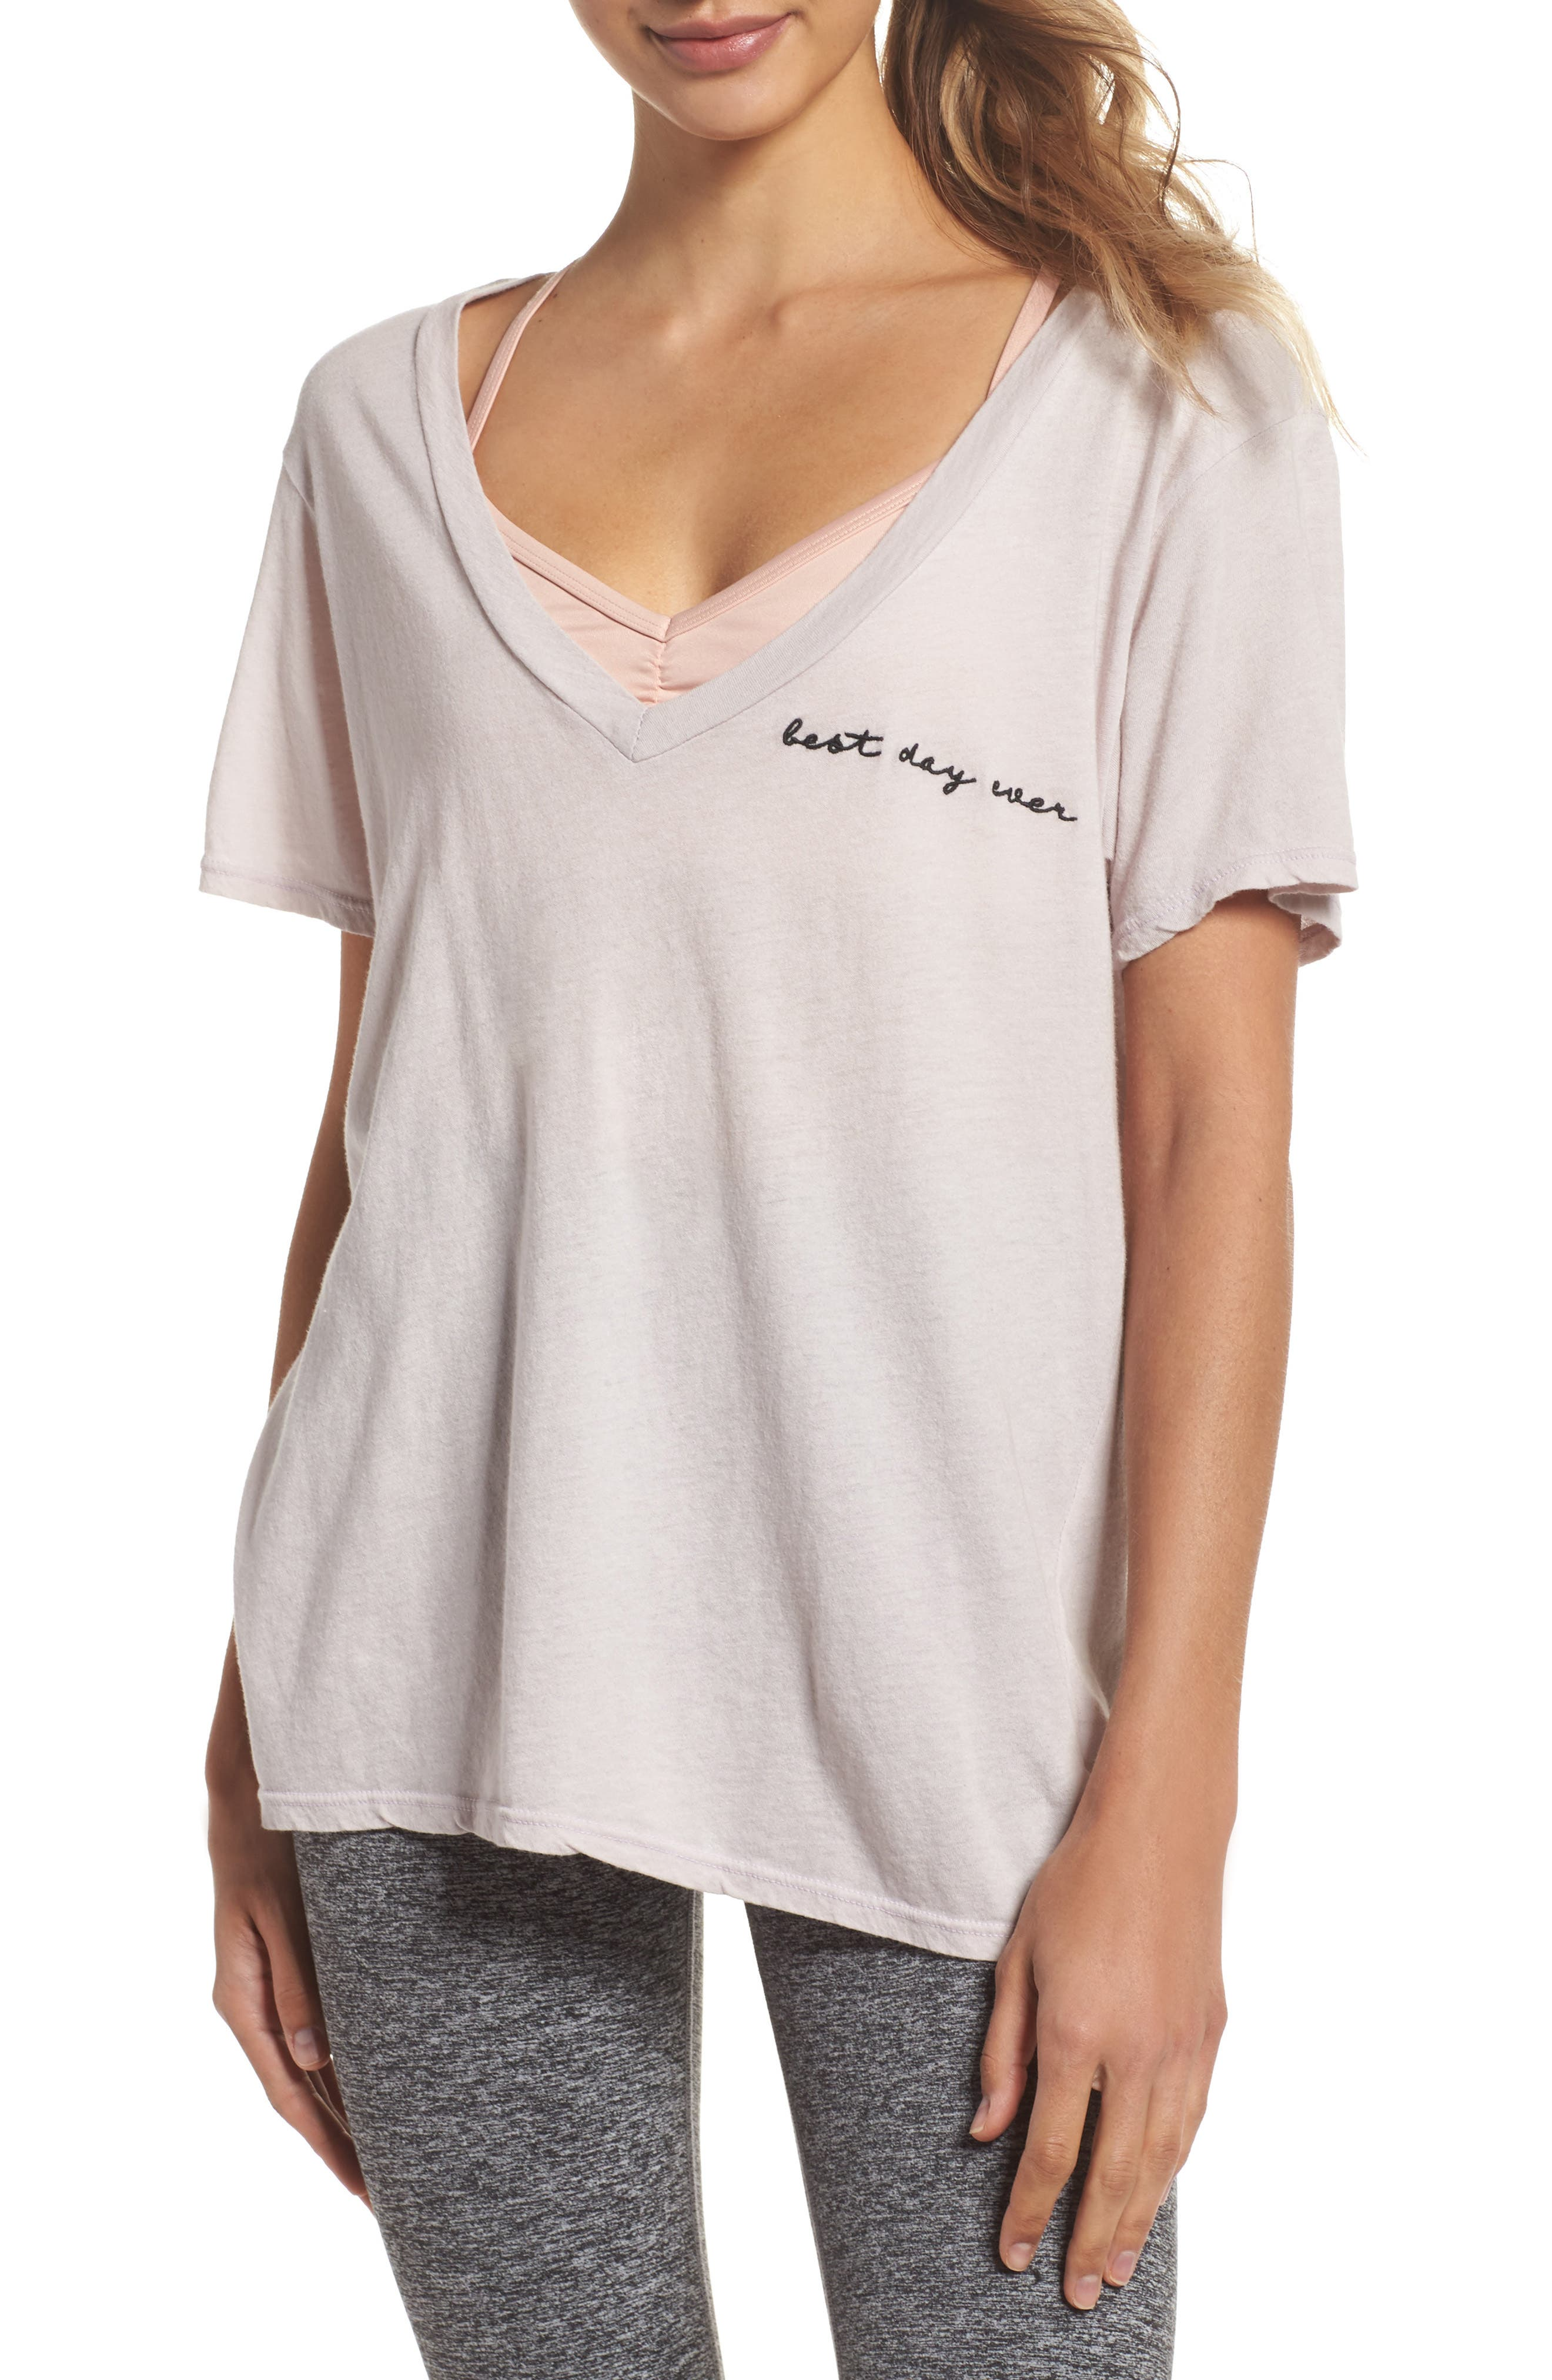 Aiden Best Day Ever V-Neck Shirt,                         Main,                         color, 500